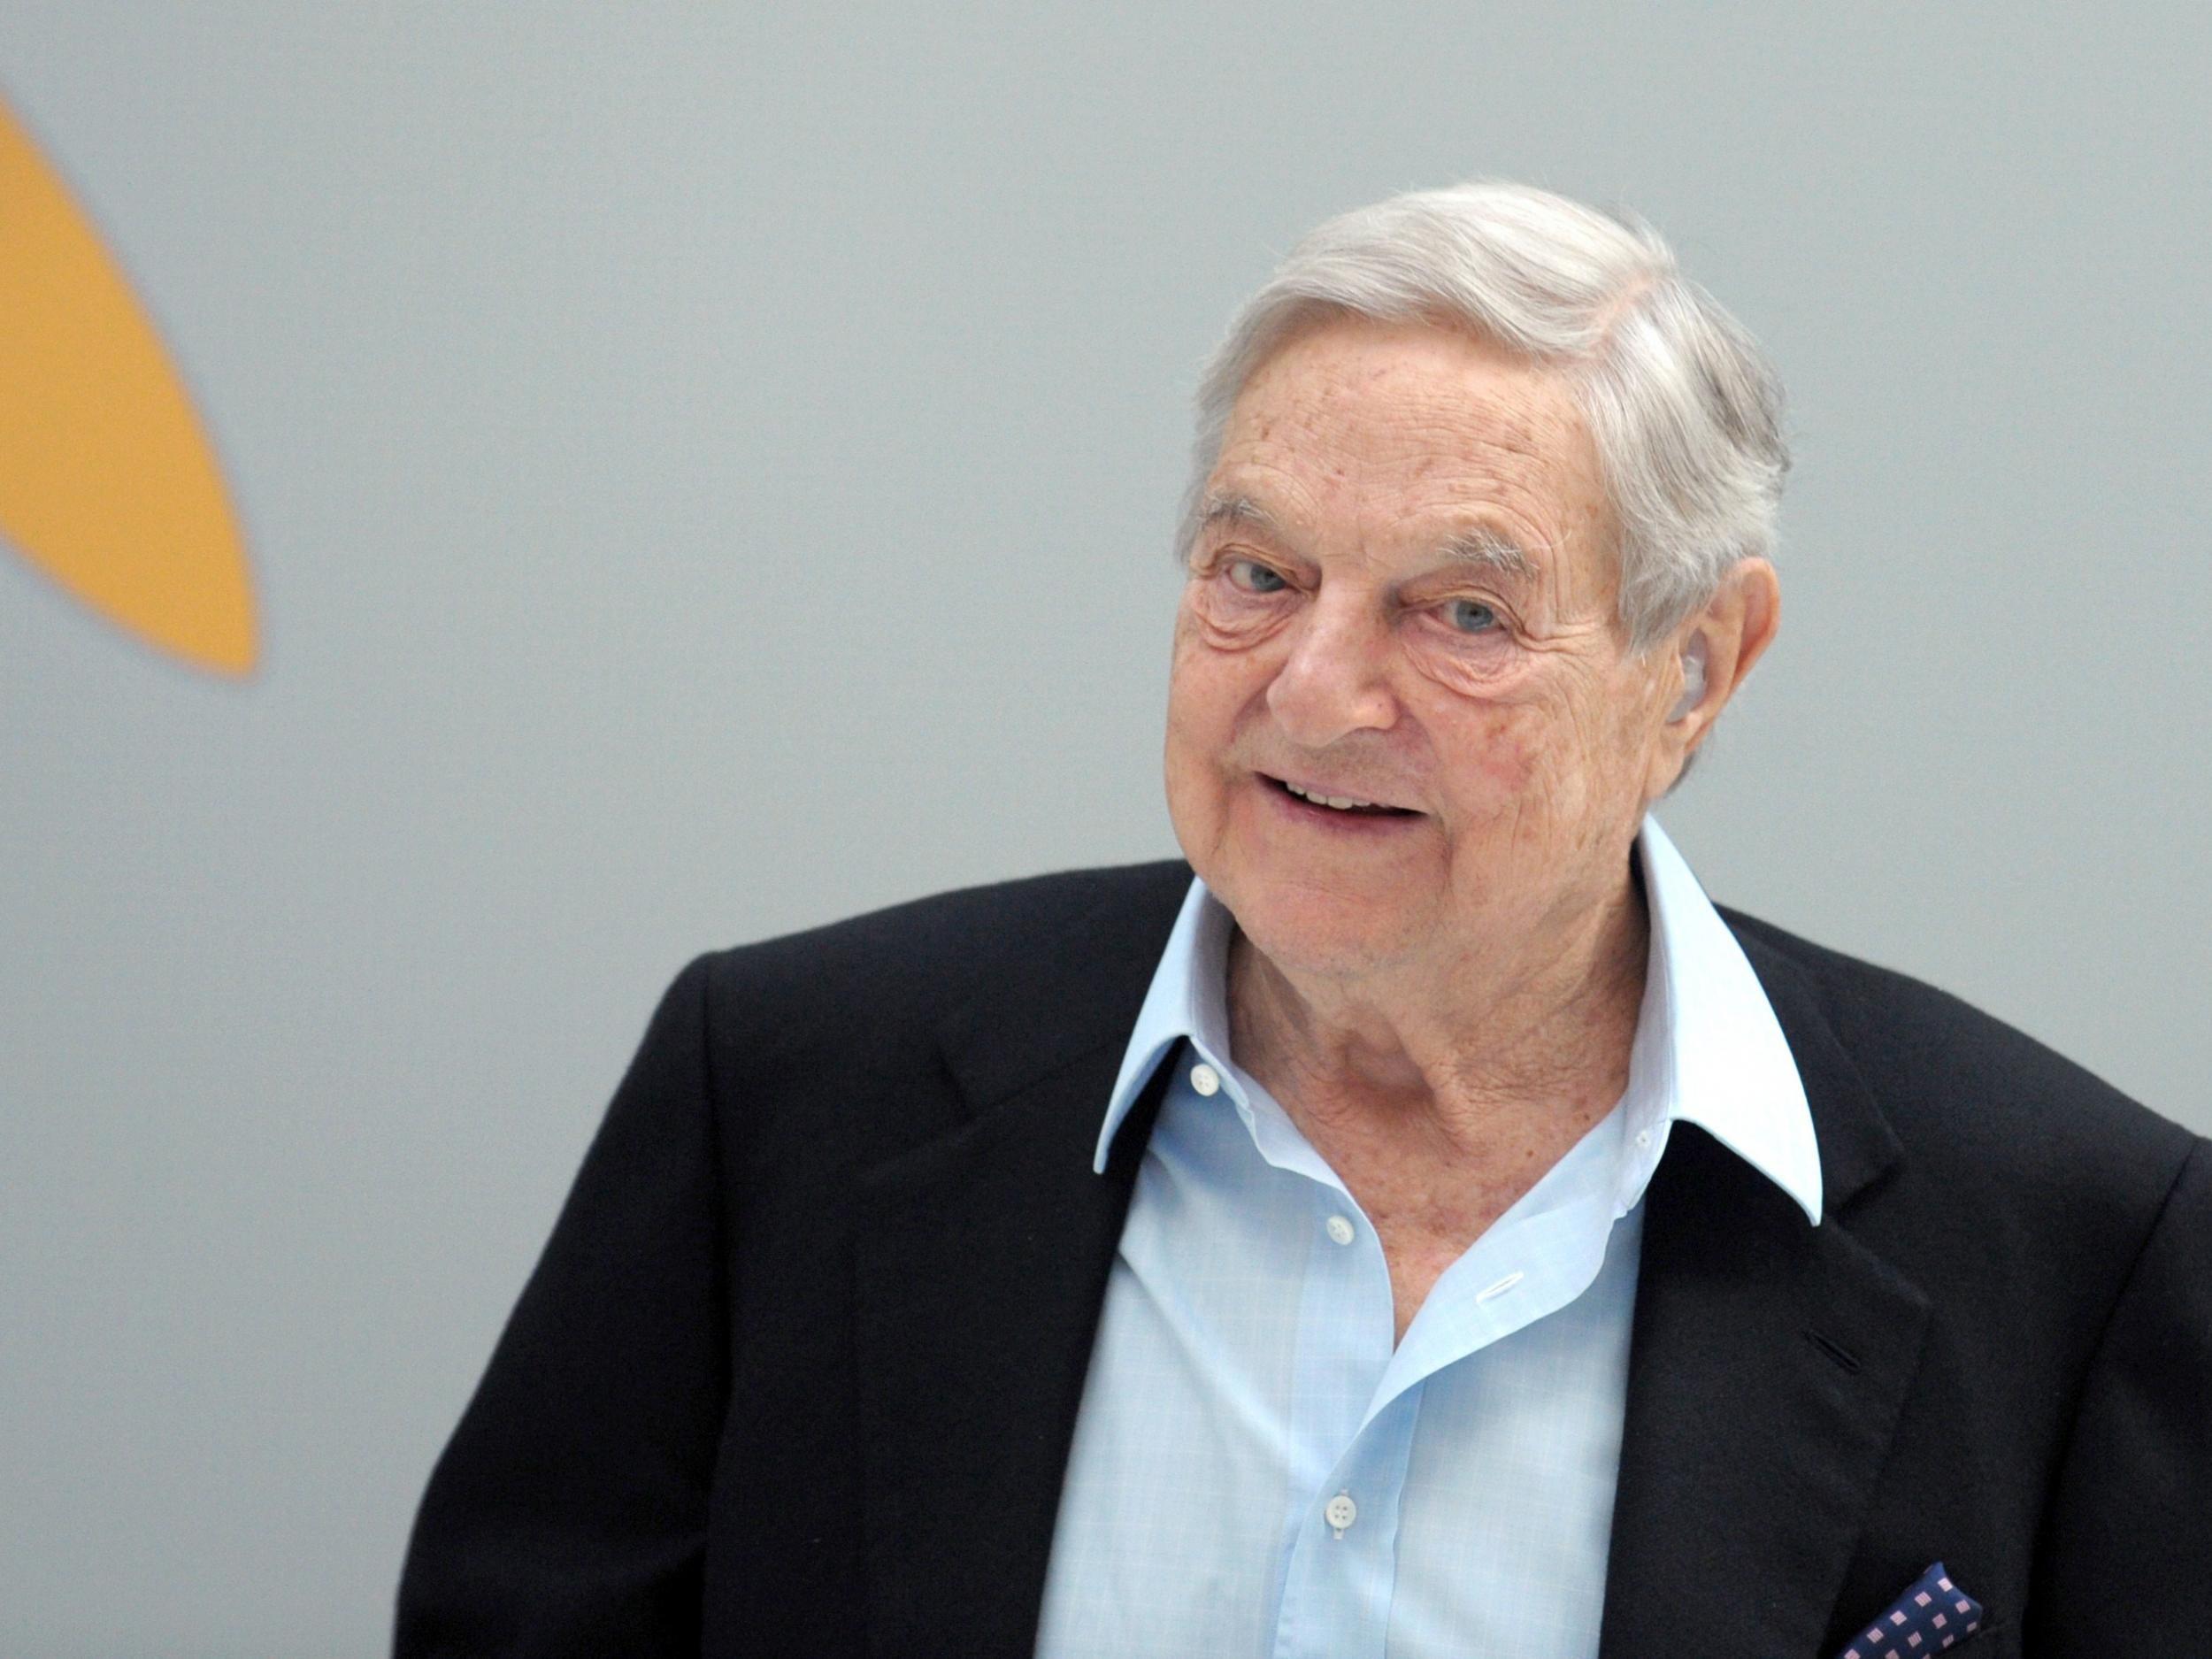 george soros the billionaire who broke the bank of england wins